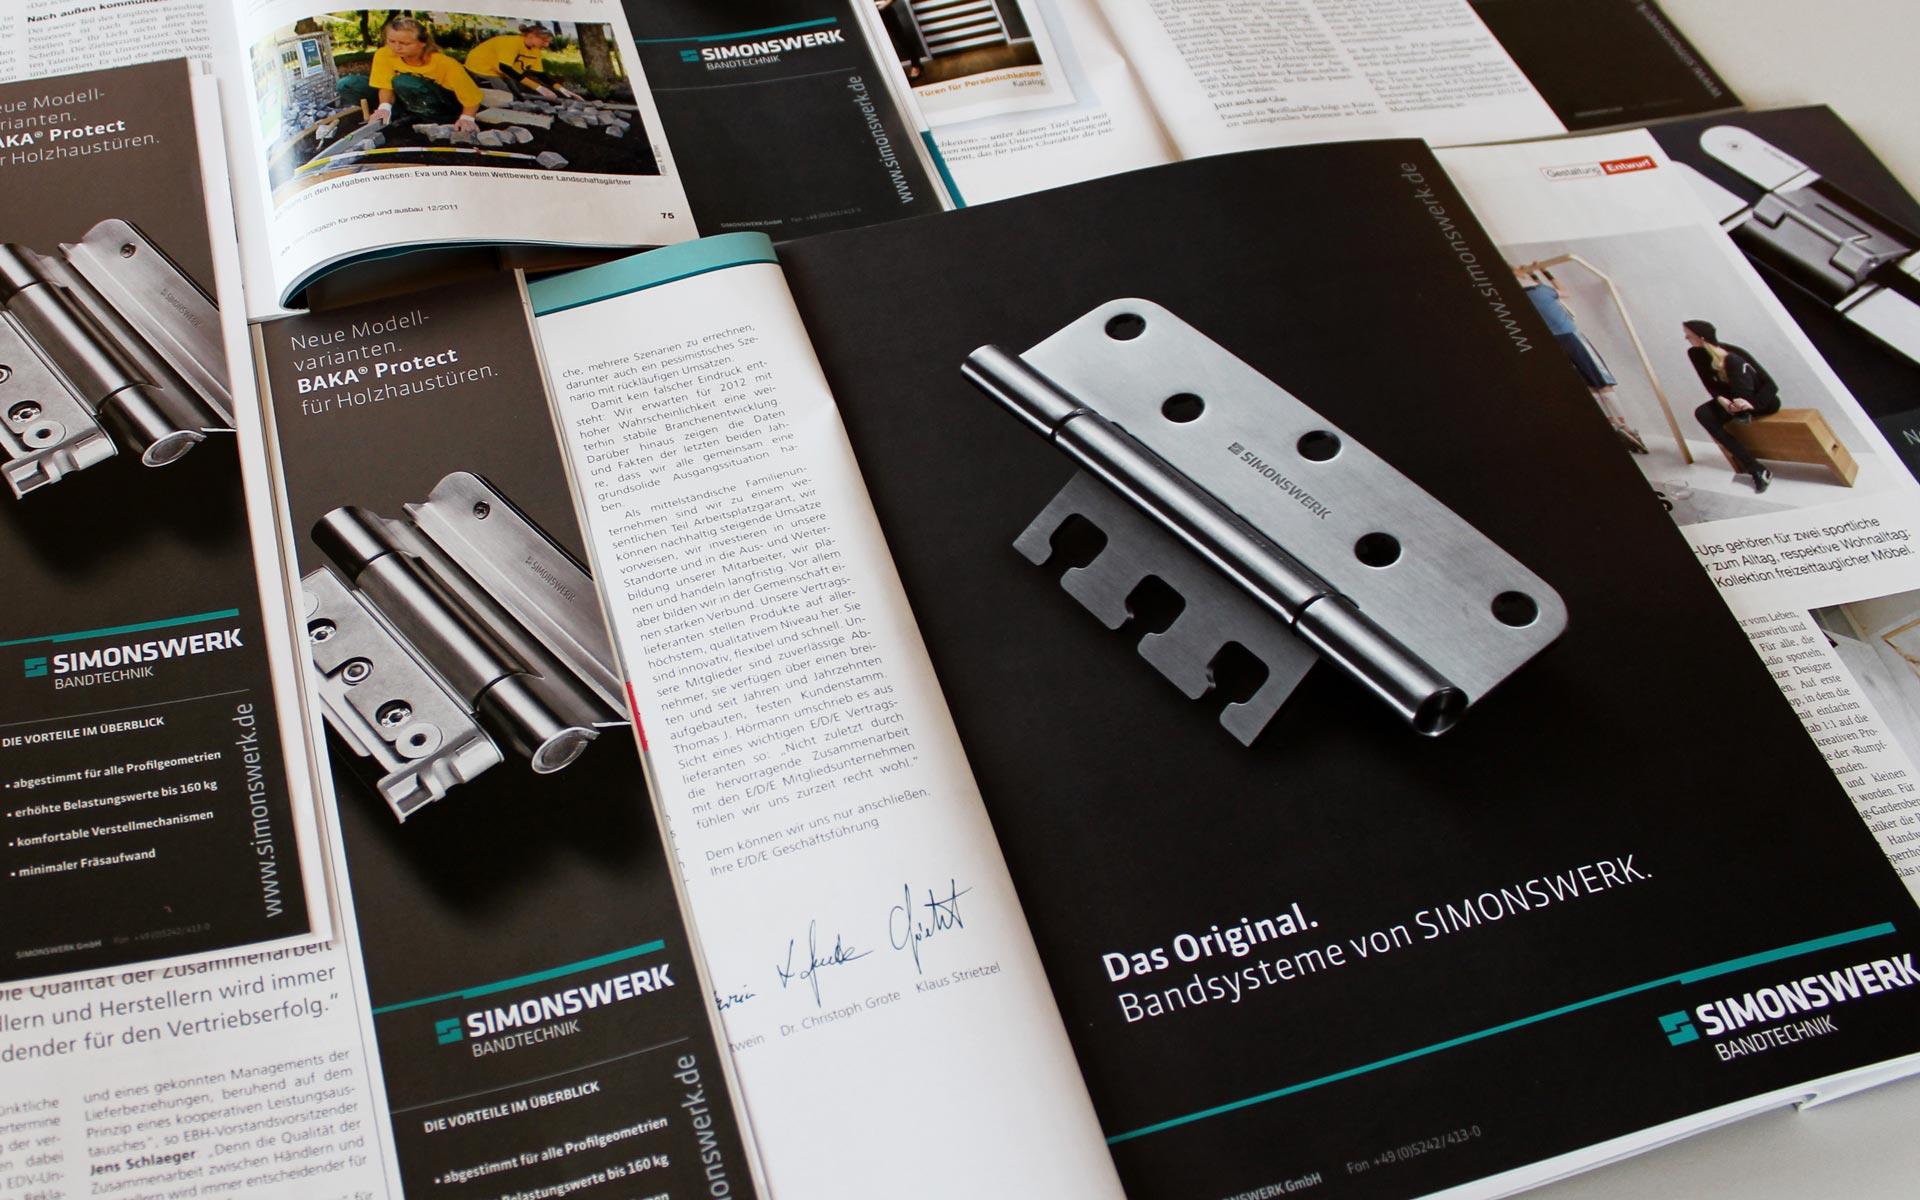 Simonswerk Corporate Design, Anzeigengestaltung